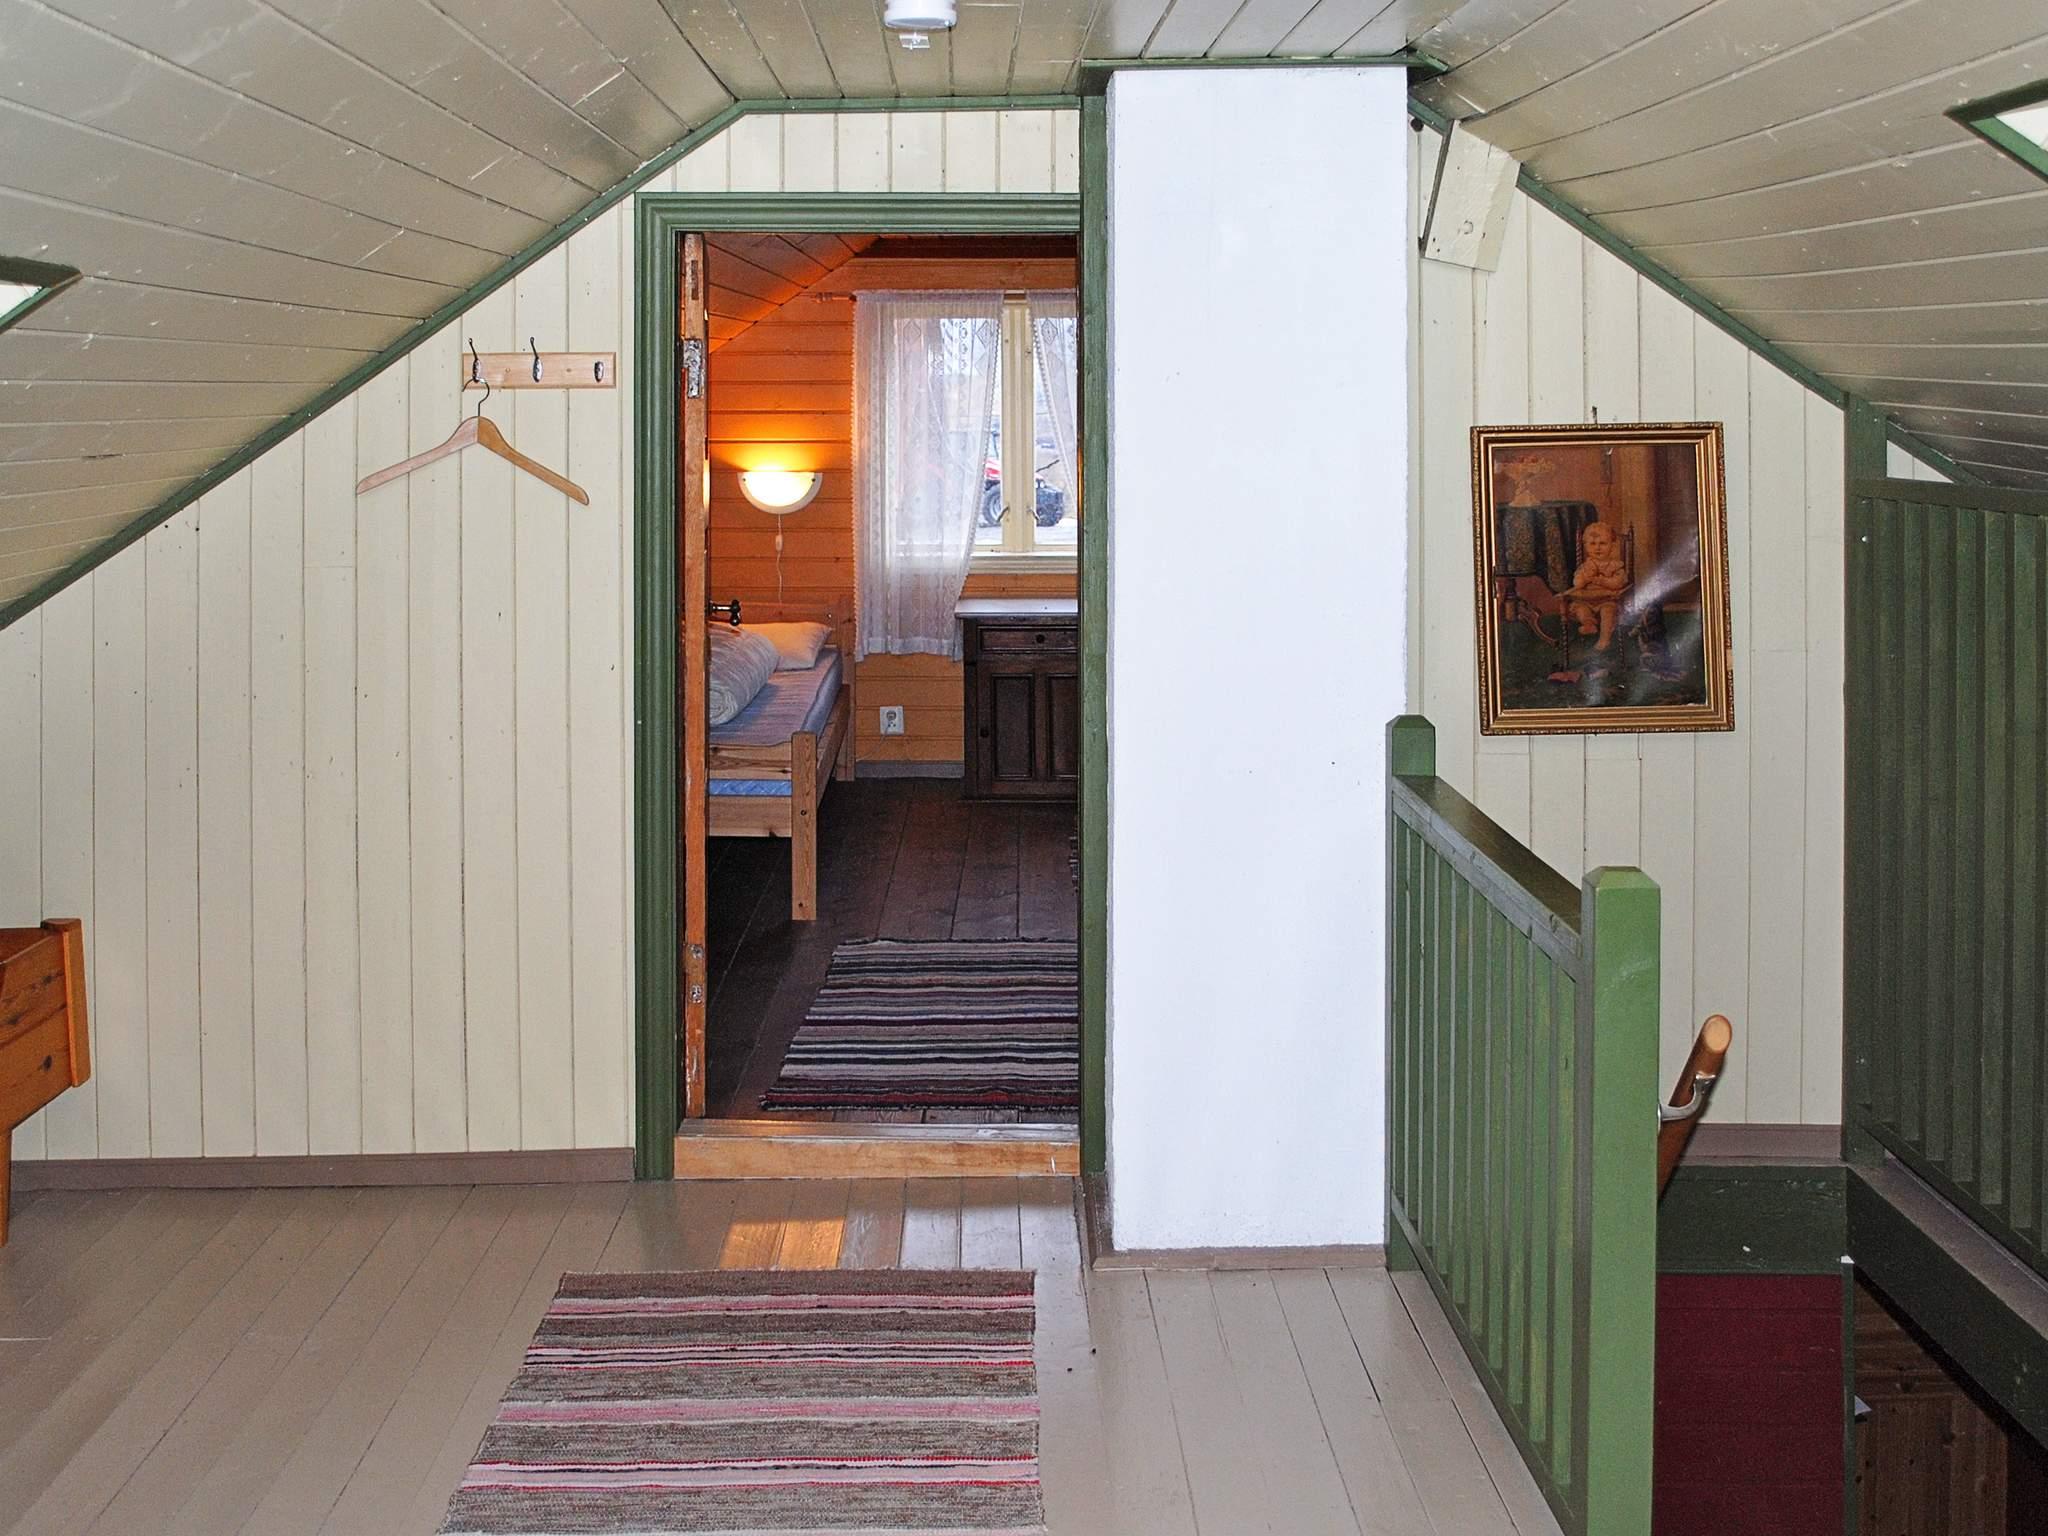 Ferienhaus Etne (83639), Etne, Hordaland - Hardangerfjord, Westnorwegen, Norwegen, Bild 12